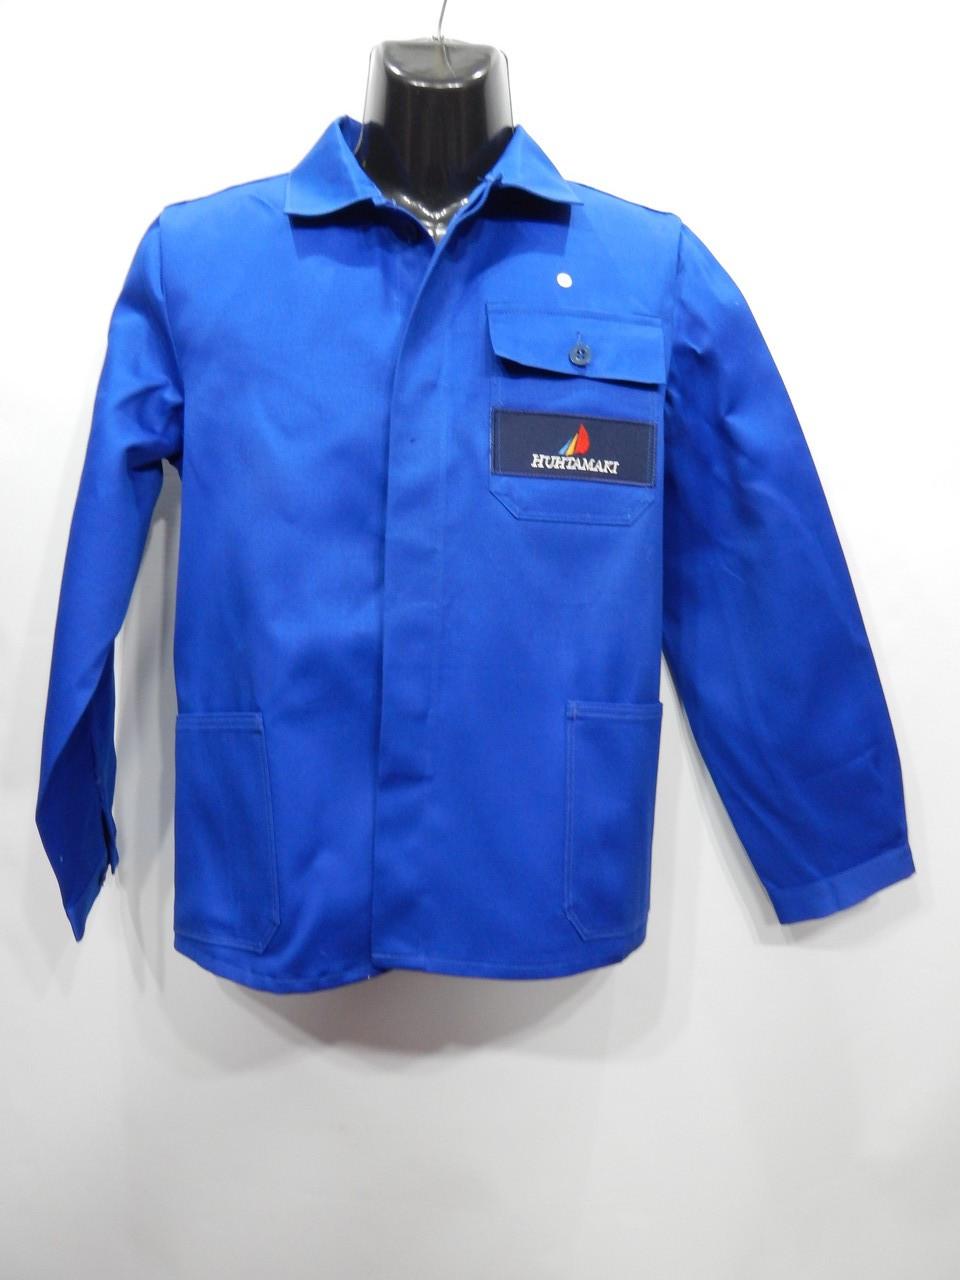 Куртка мужская рабочая демисезонная Merks р.44 003МРК